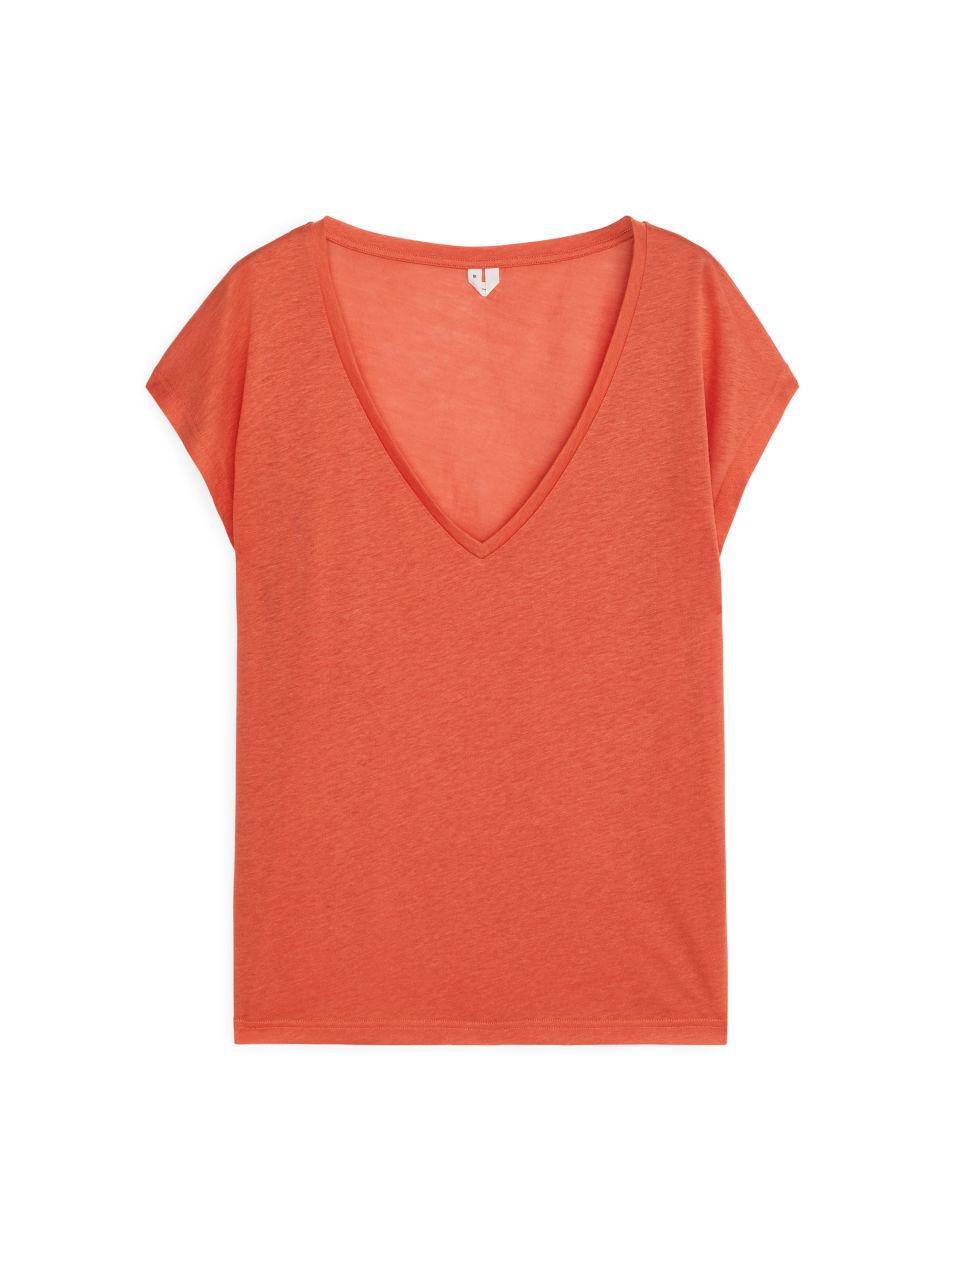 Semi-Sheer T-Shirt - Orange